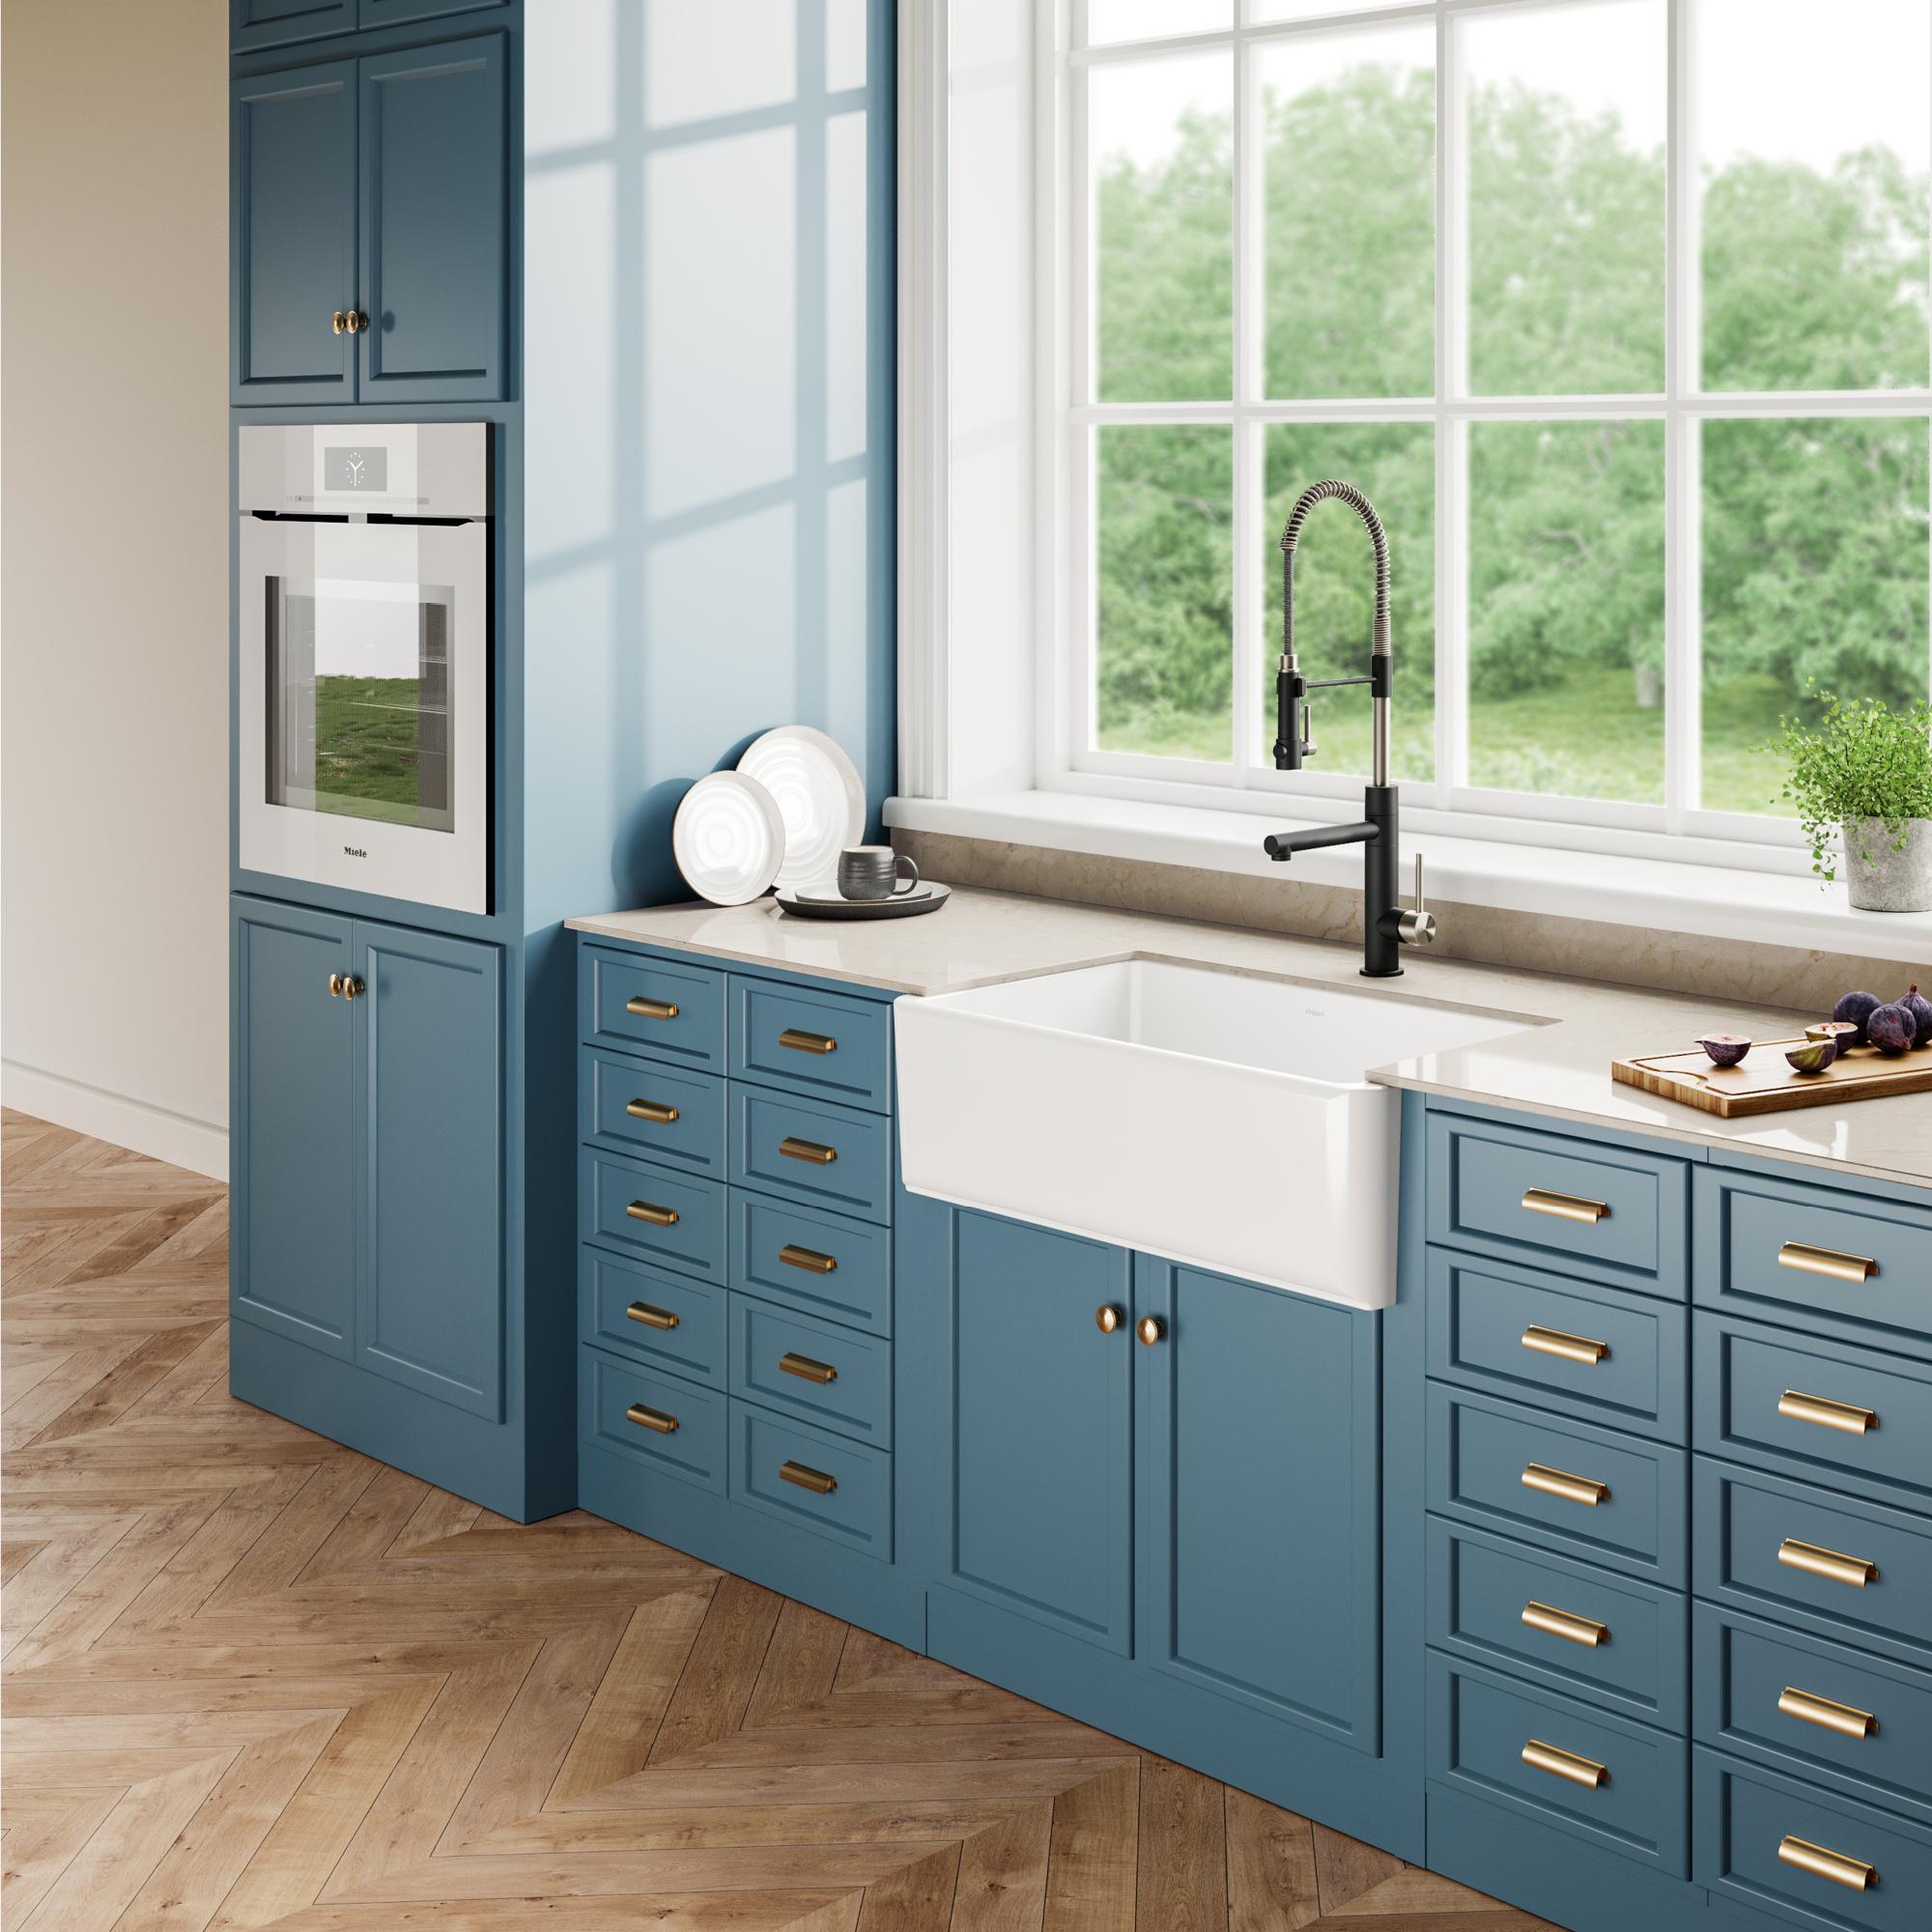 Apron Fireclay White Kitchen Sink